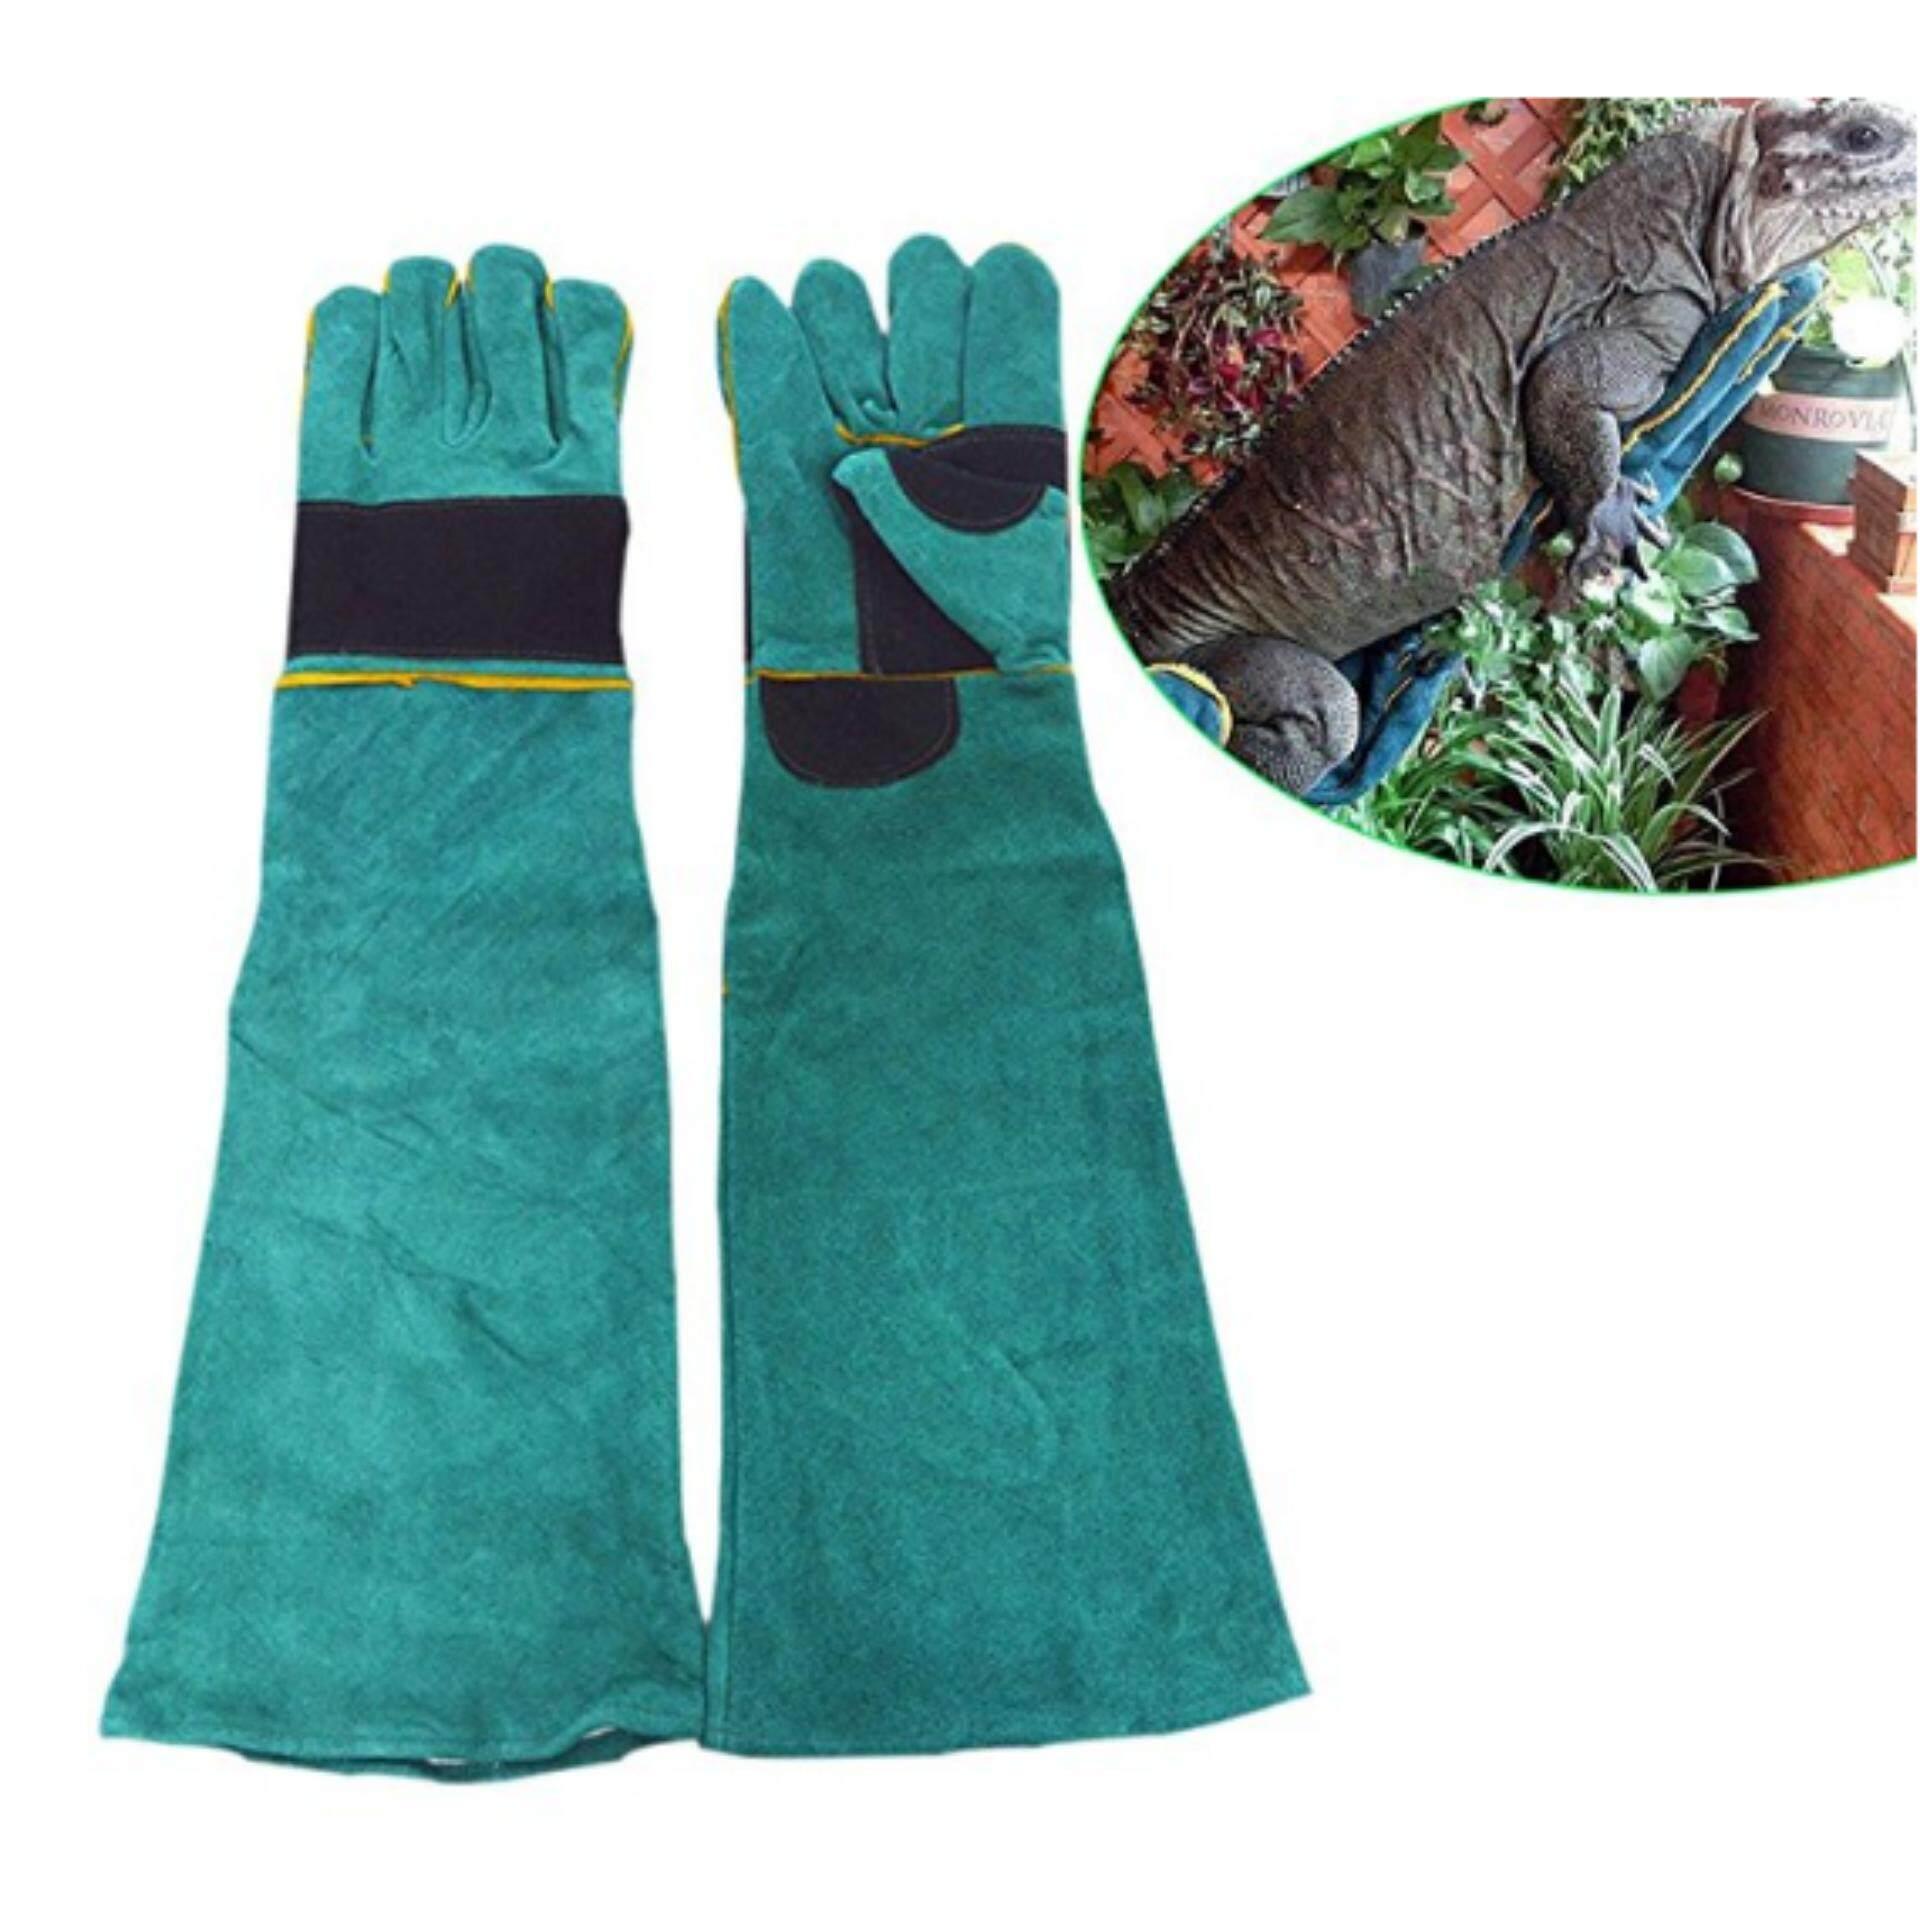 Animal Handling Anti-bite/scratch Gloves For Dog Cat Bird Snake Parrot Lizard Wild Animals Protection Gloves